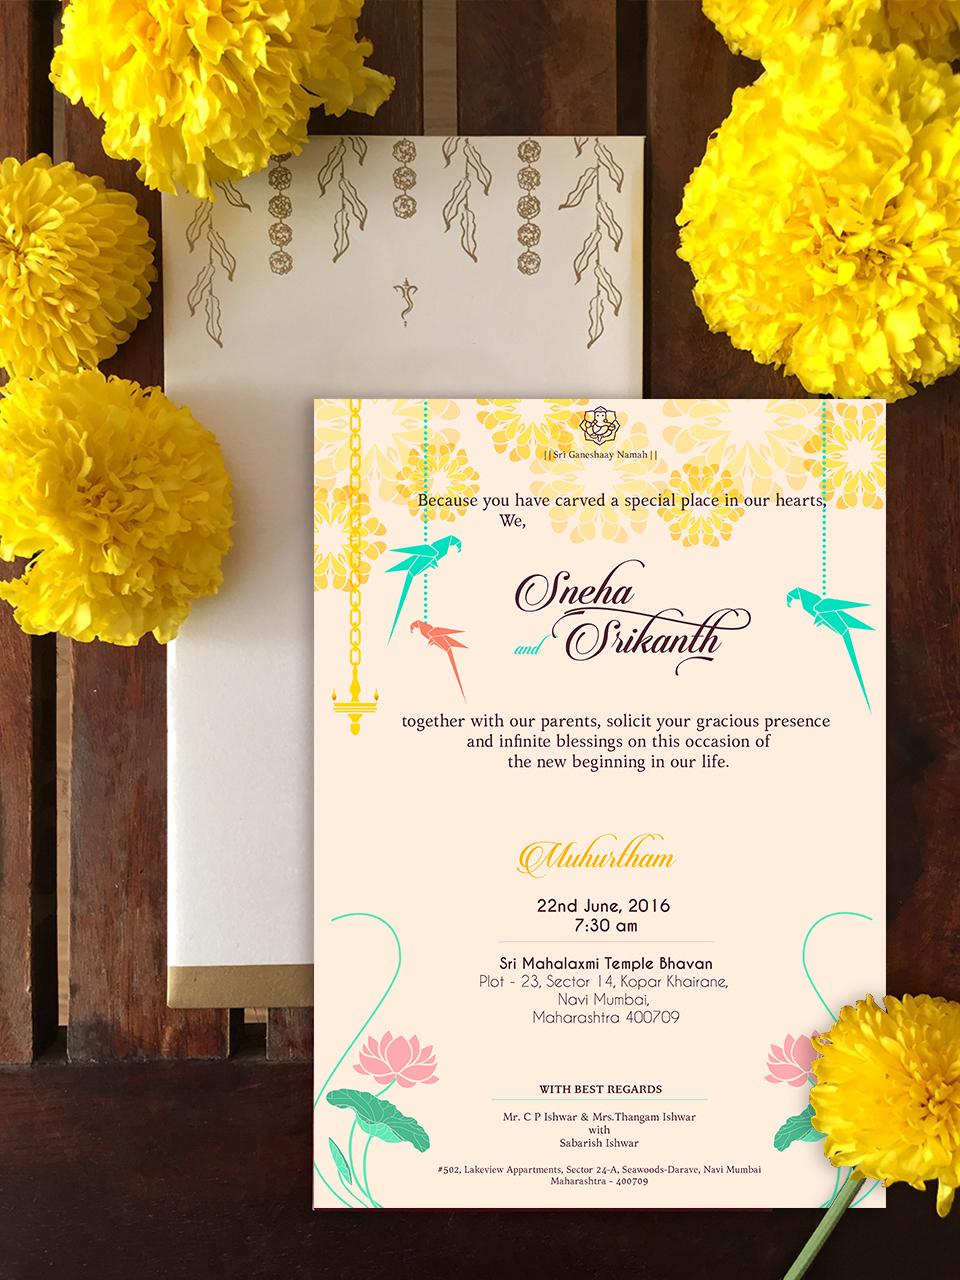 Wedding Invitation Sowmya Iyer